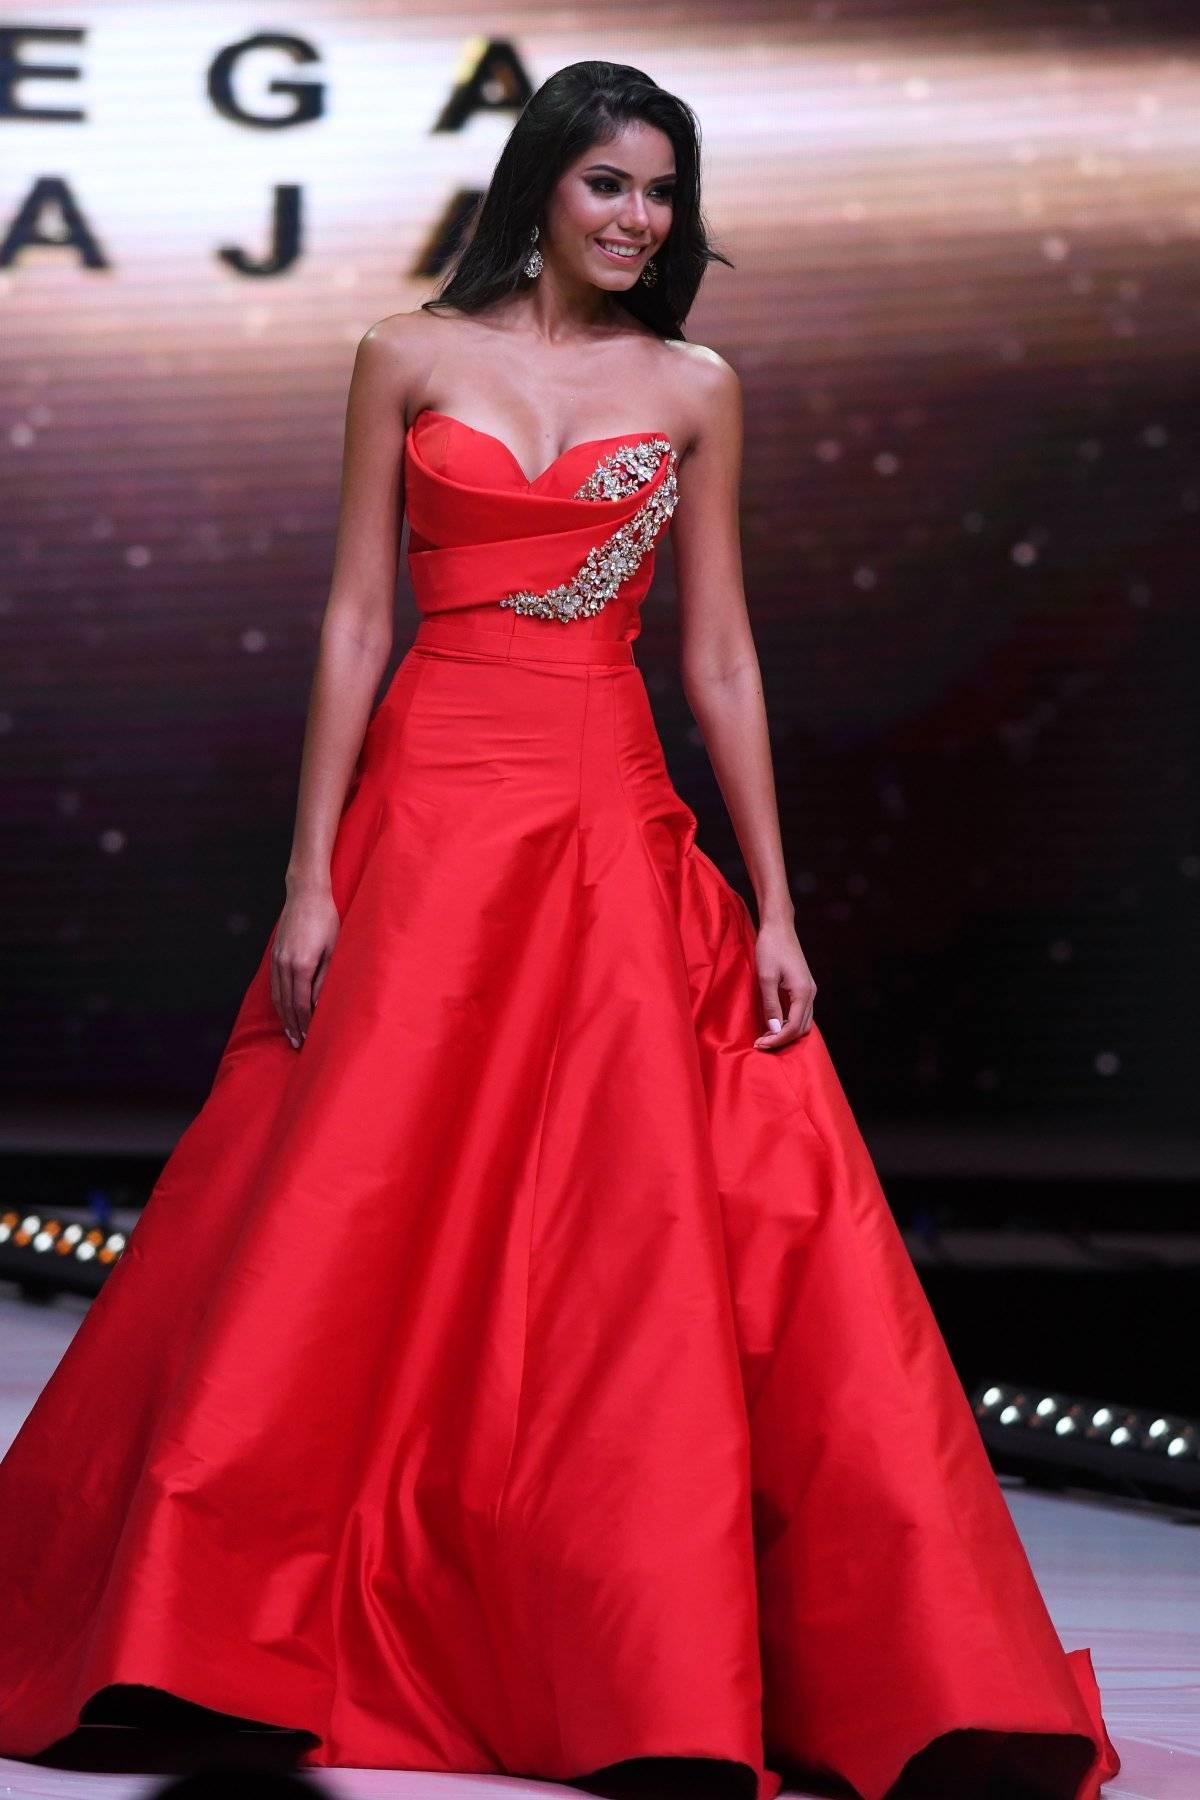 Miss Vega Baja - Alejandra Pagán